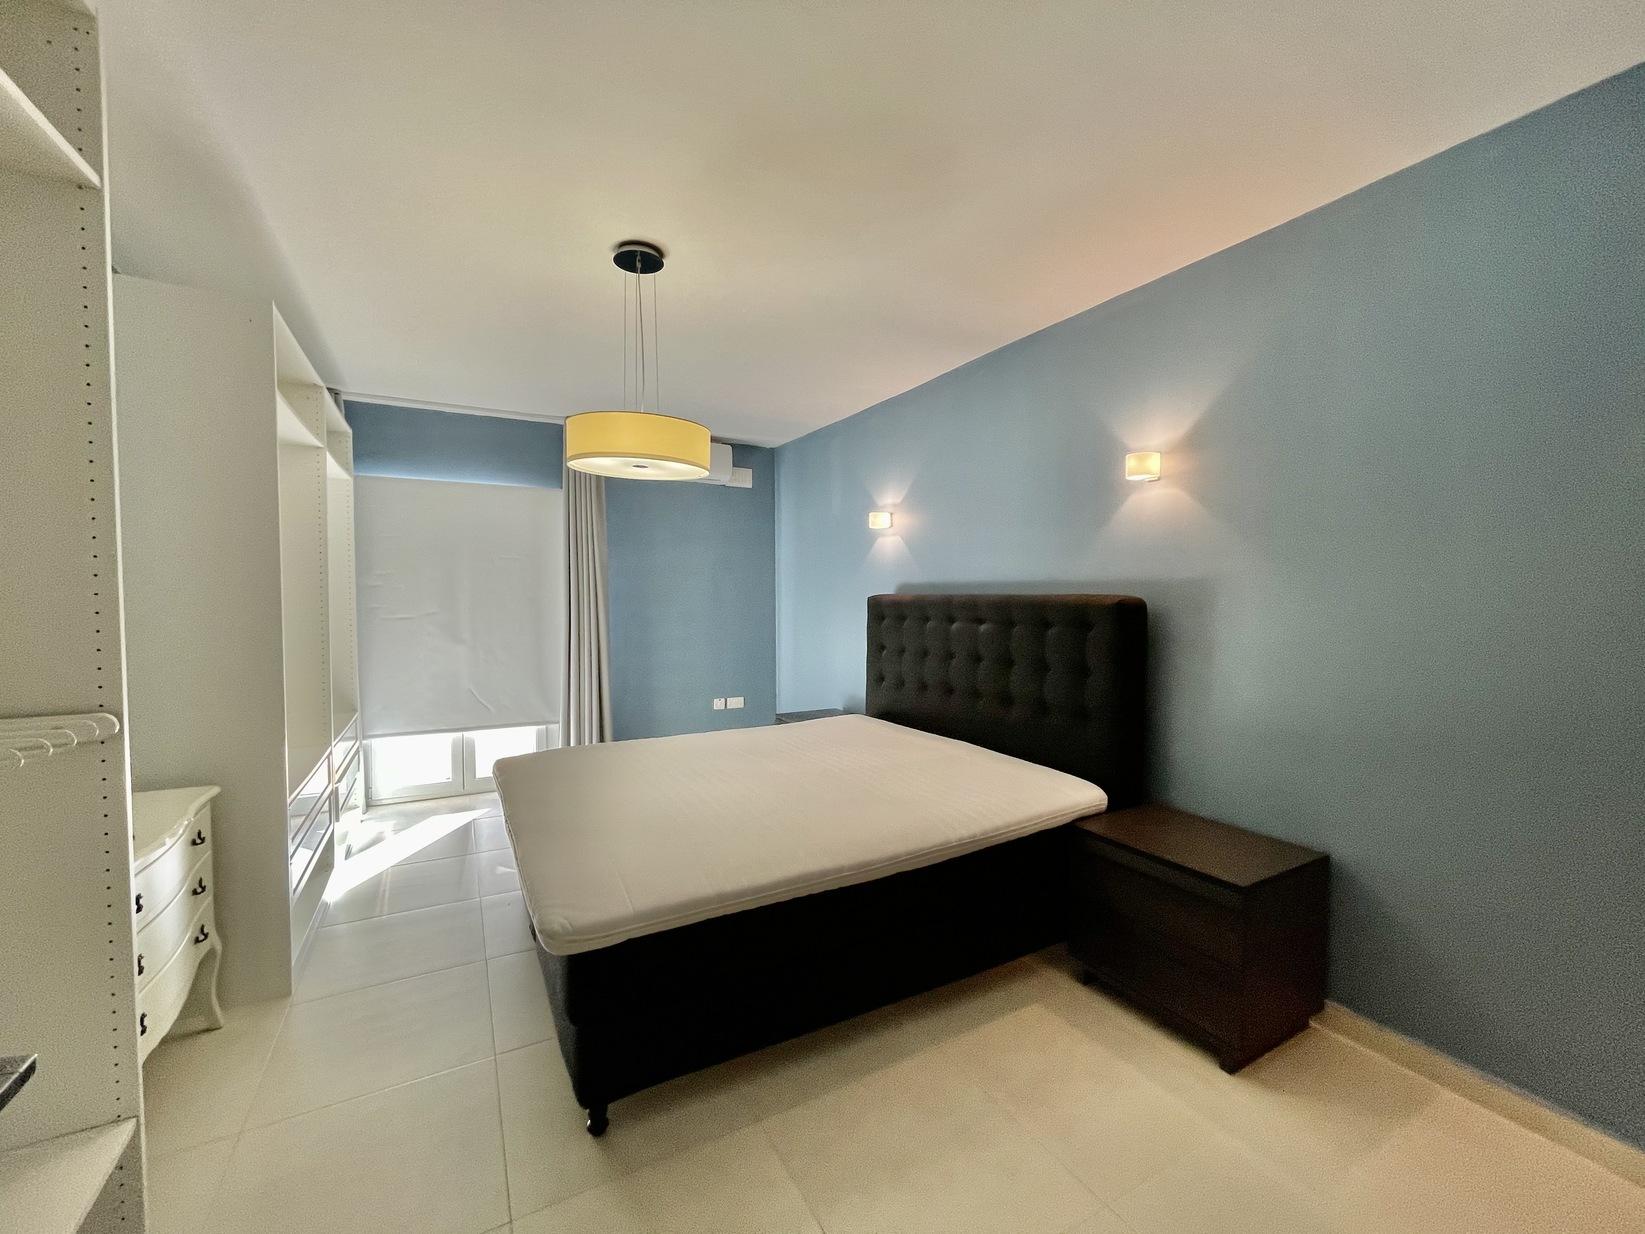 3 bed Apartment For Rent in Bahar Ic-Caghaq, Bahar ic-Caghaq - thumb 10